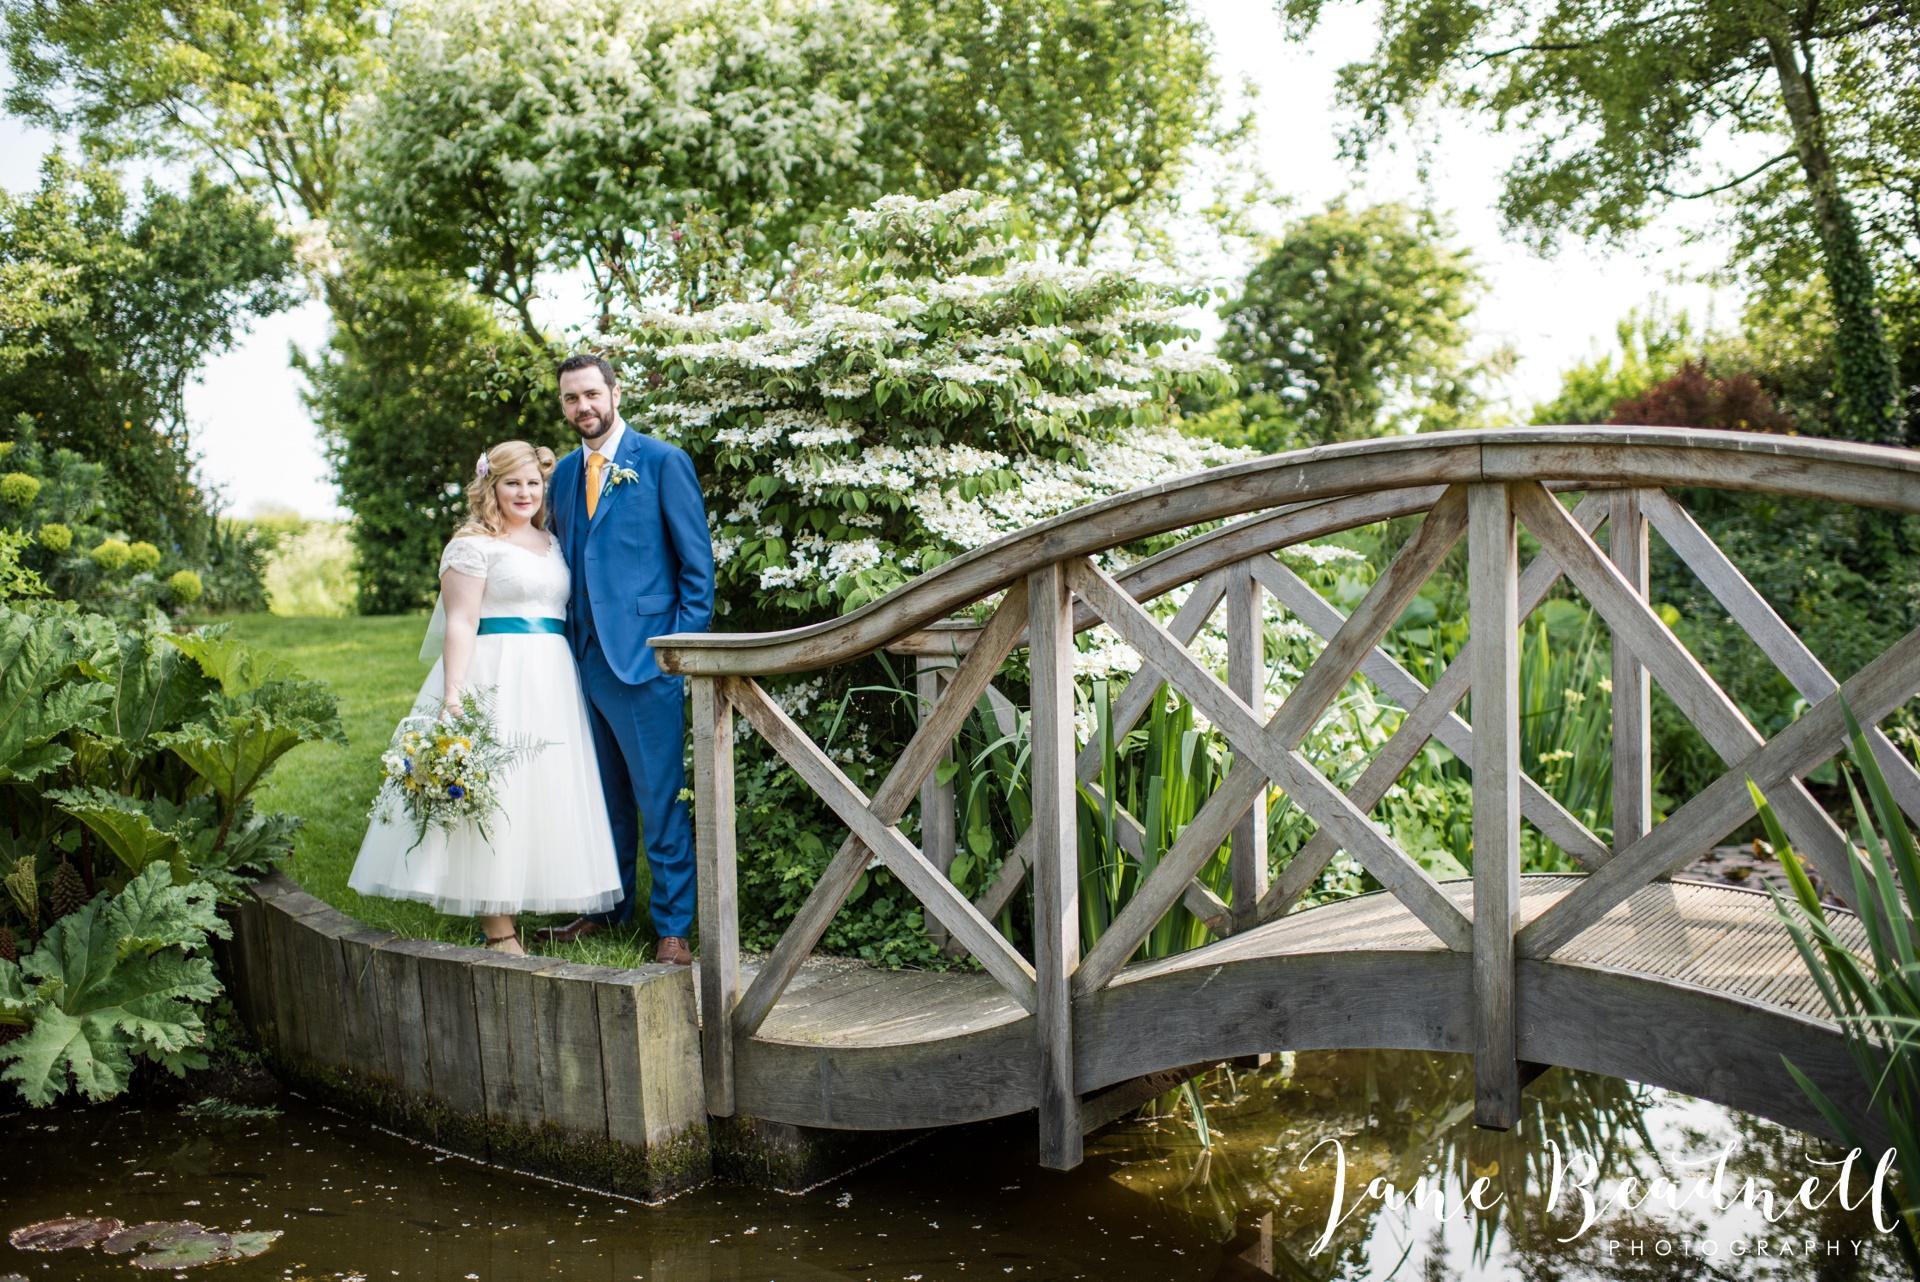 South Farm Wedding photography Hertfordshire by Jane Beadnell Photography fine art wedding photographer_0133